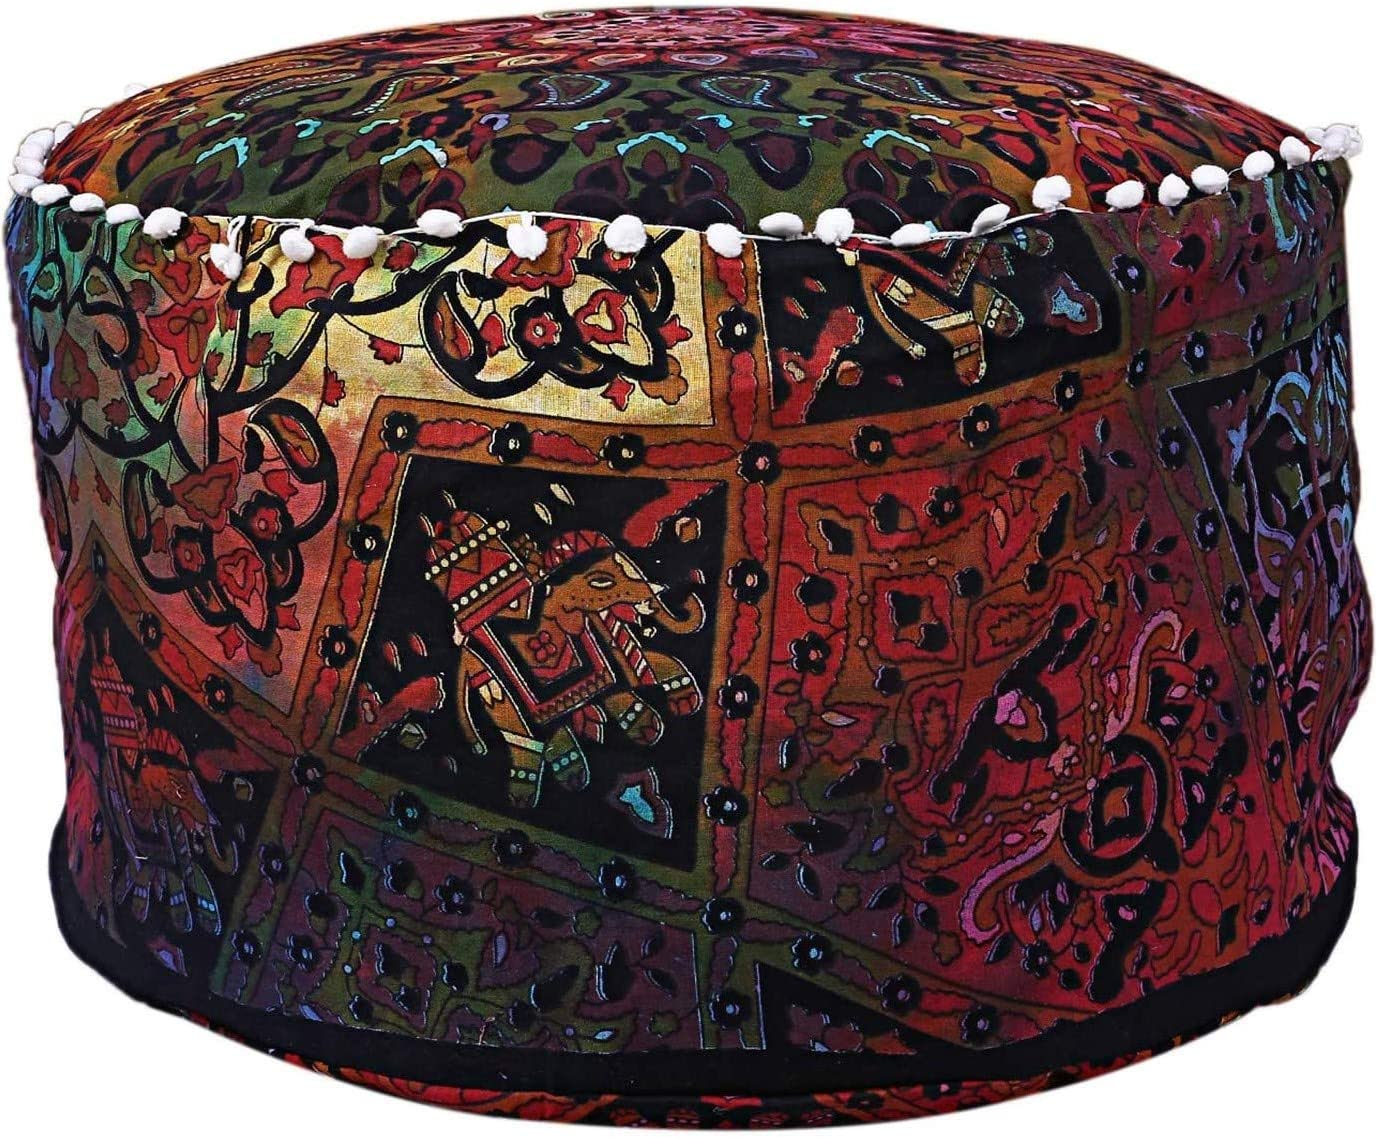 Indian Mandala Pouf Ottoman Cotton Floor Pillow Hippie Boho Decorative Home Decor Footstool Cover Bohemian (Multi)